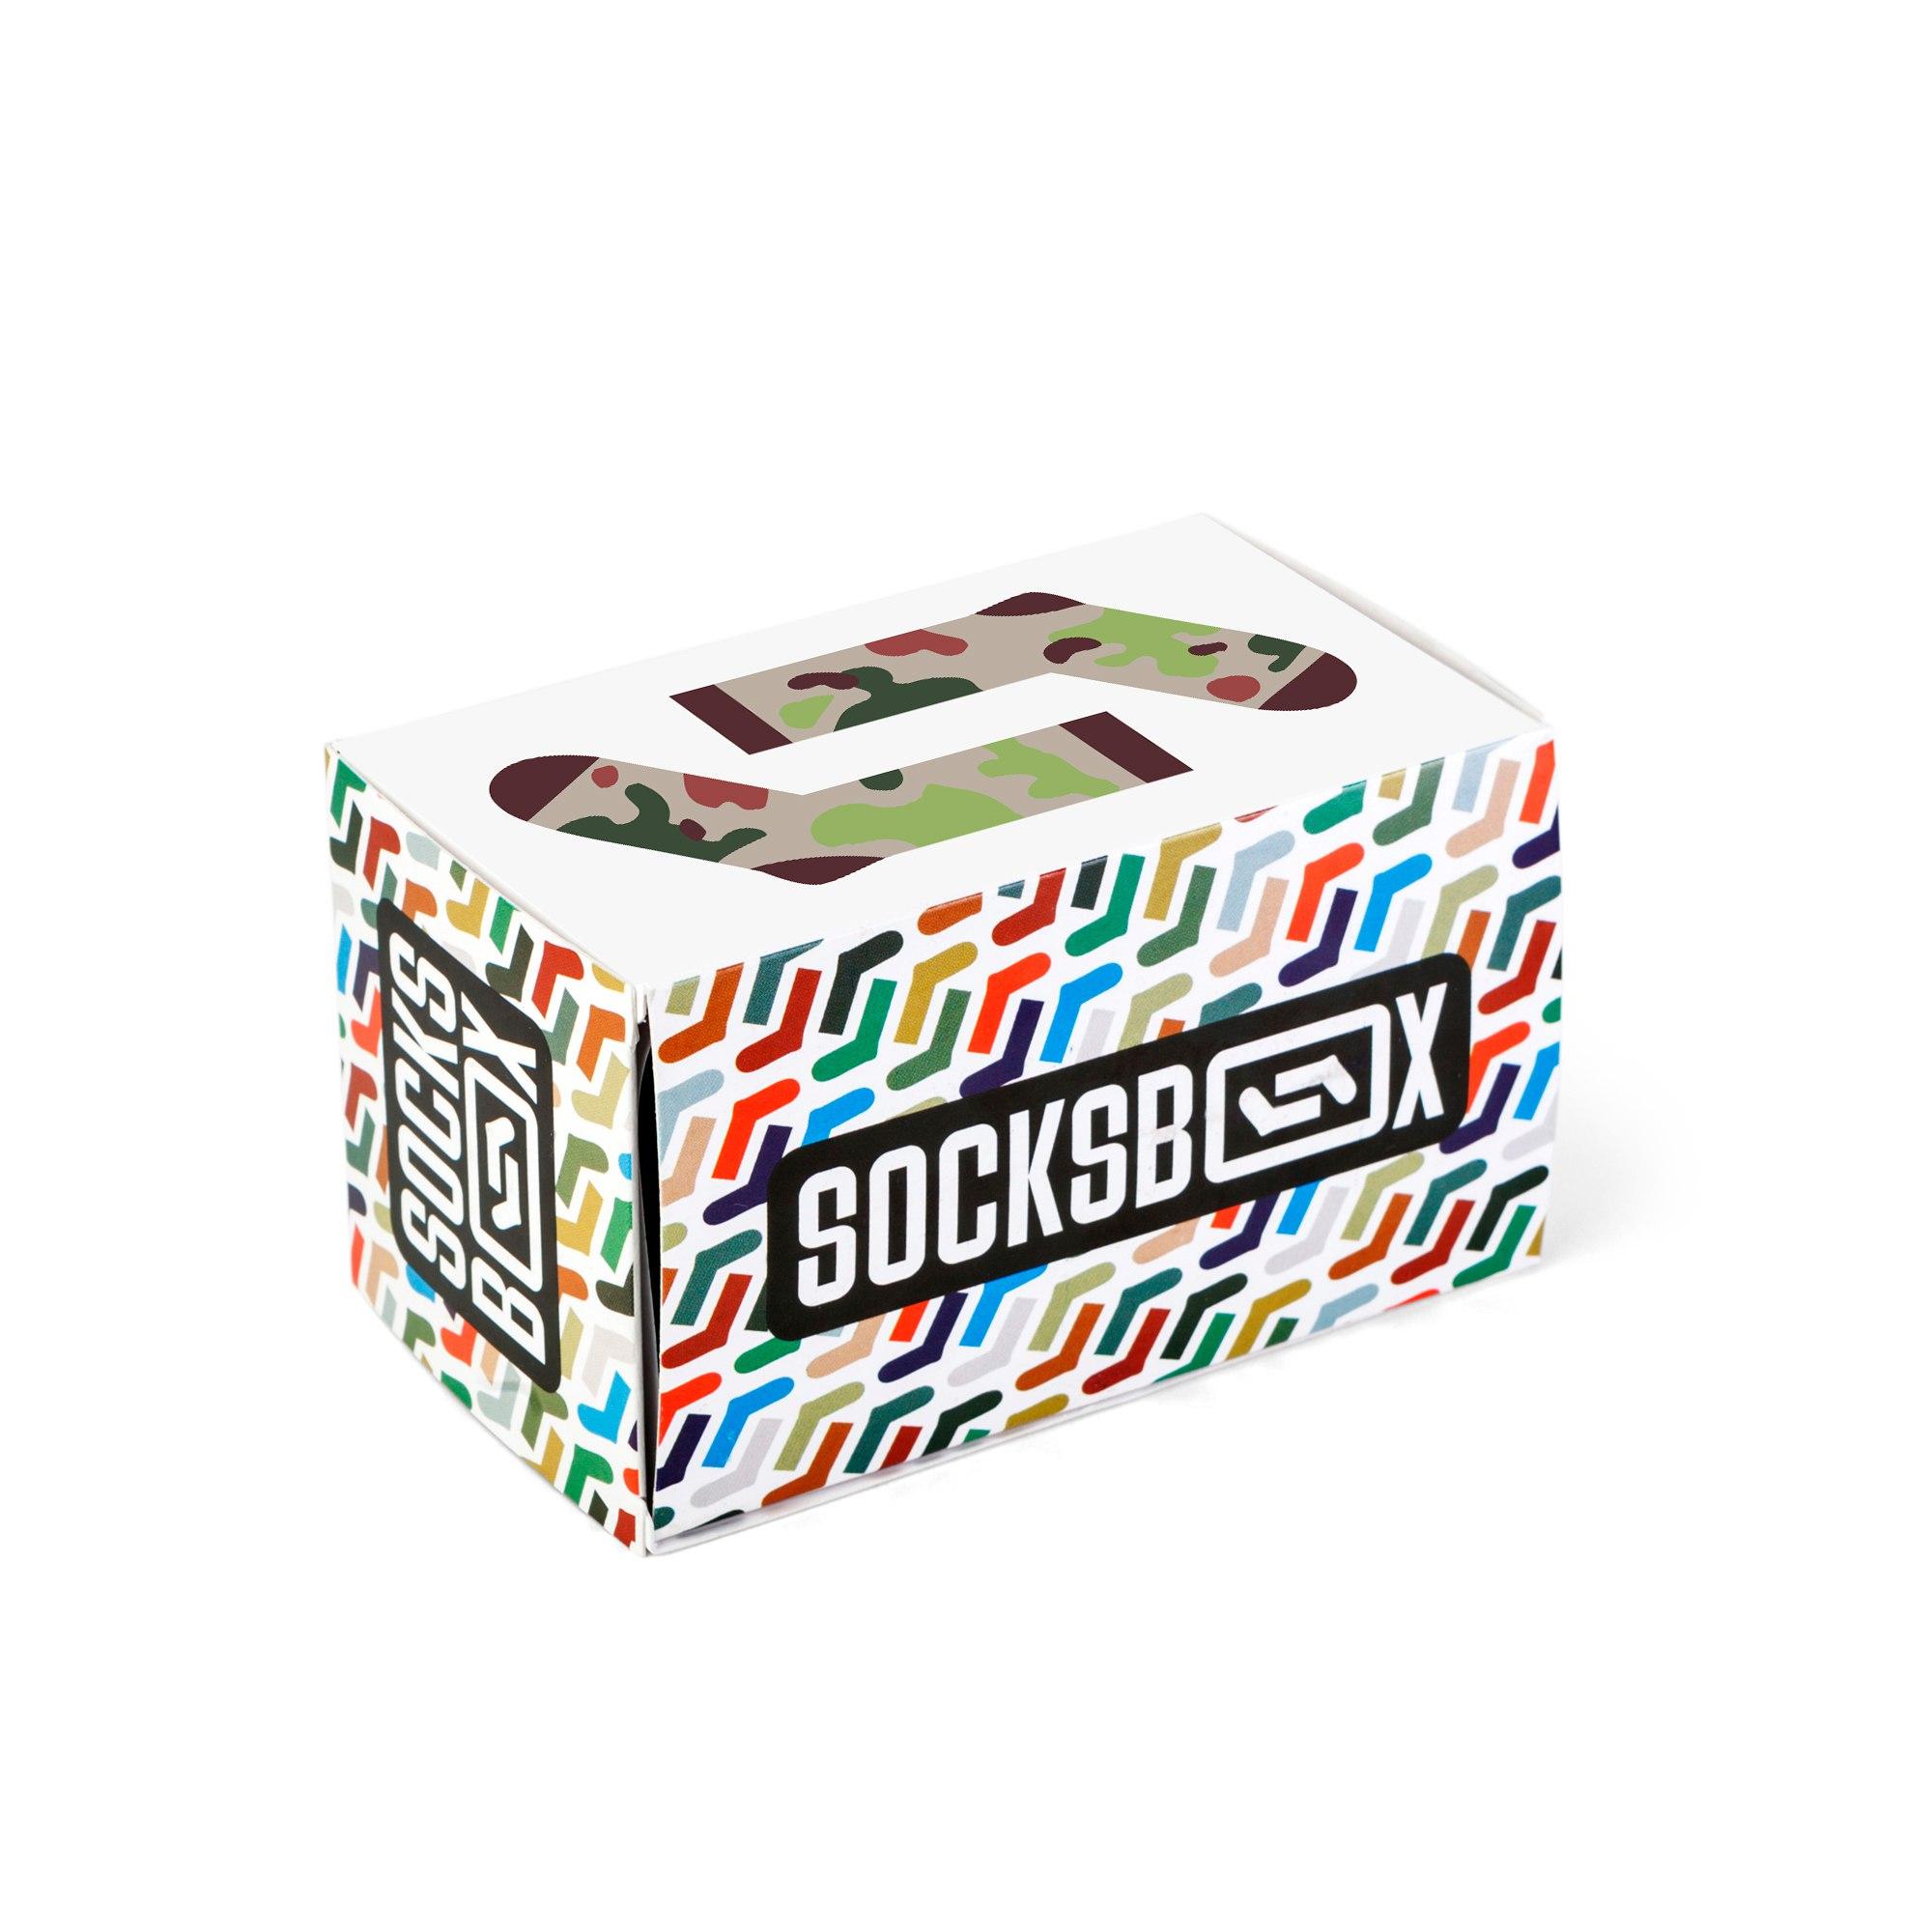 Носки унисекс Socks Box СоксБокс Камо Грин разноцветные 41-43